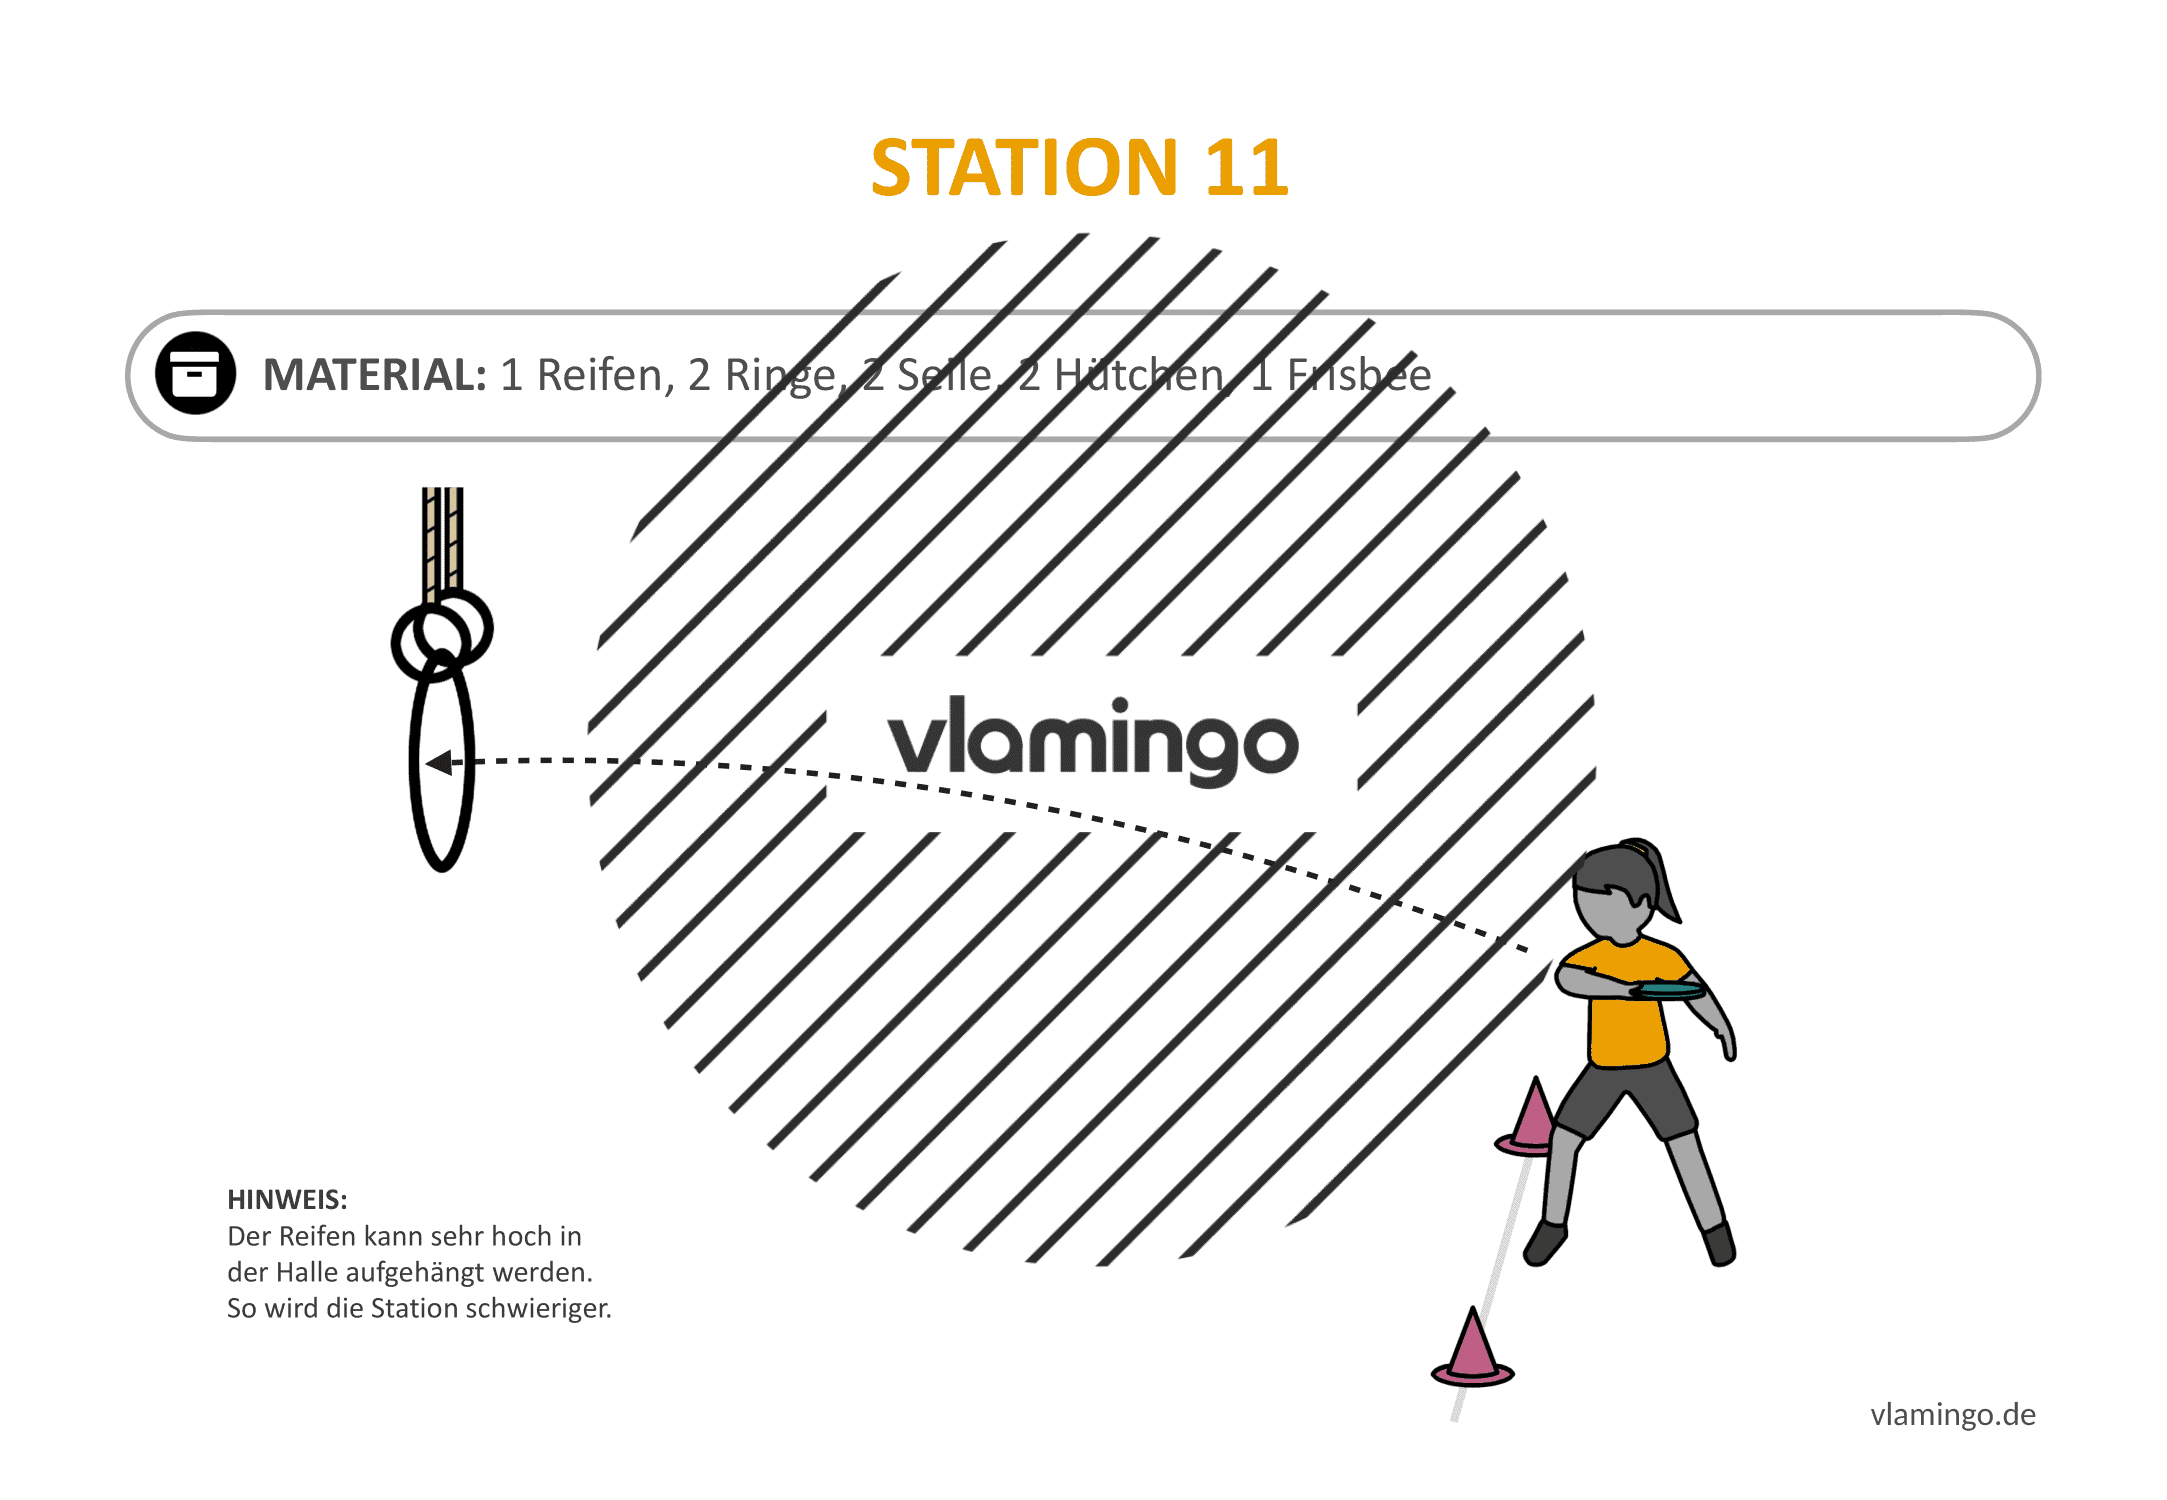 Frisbeegolf (Disc-Golf) - Station 11